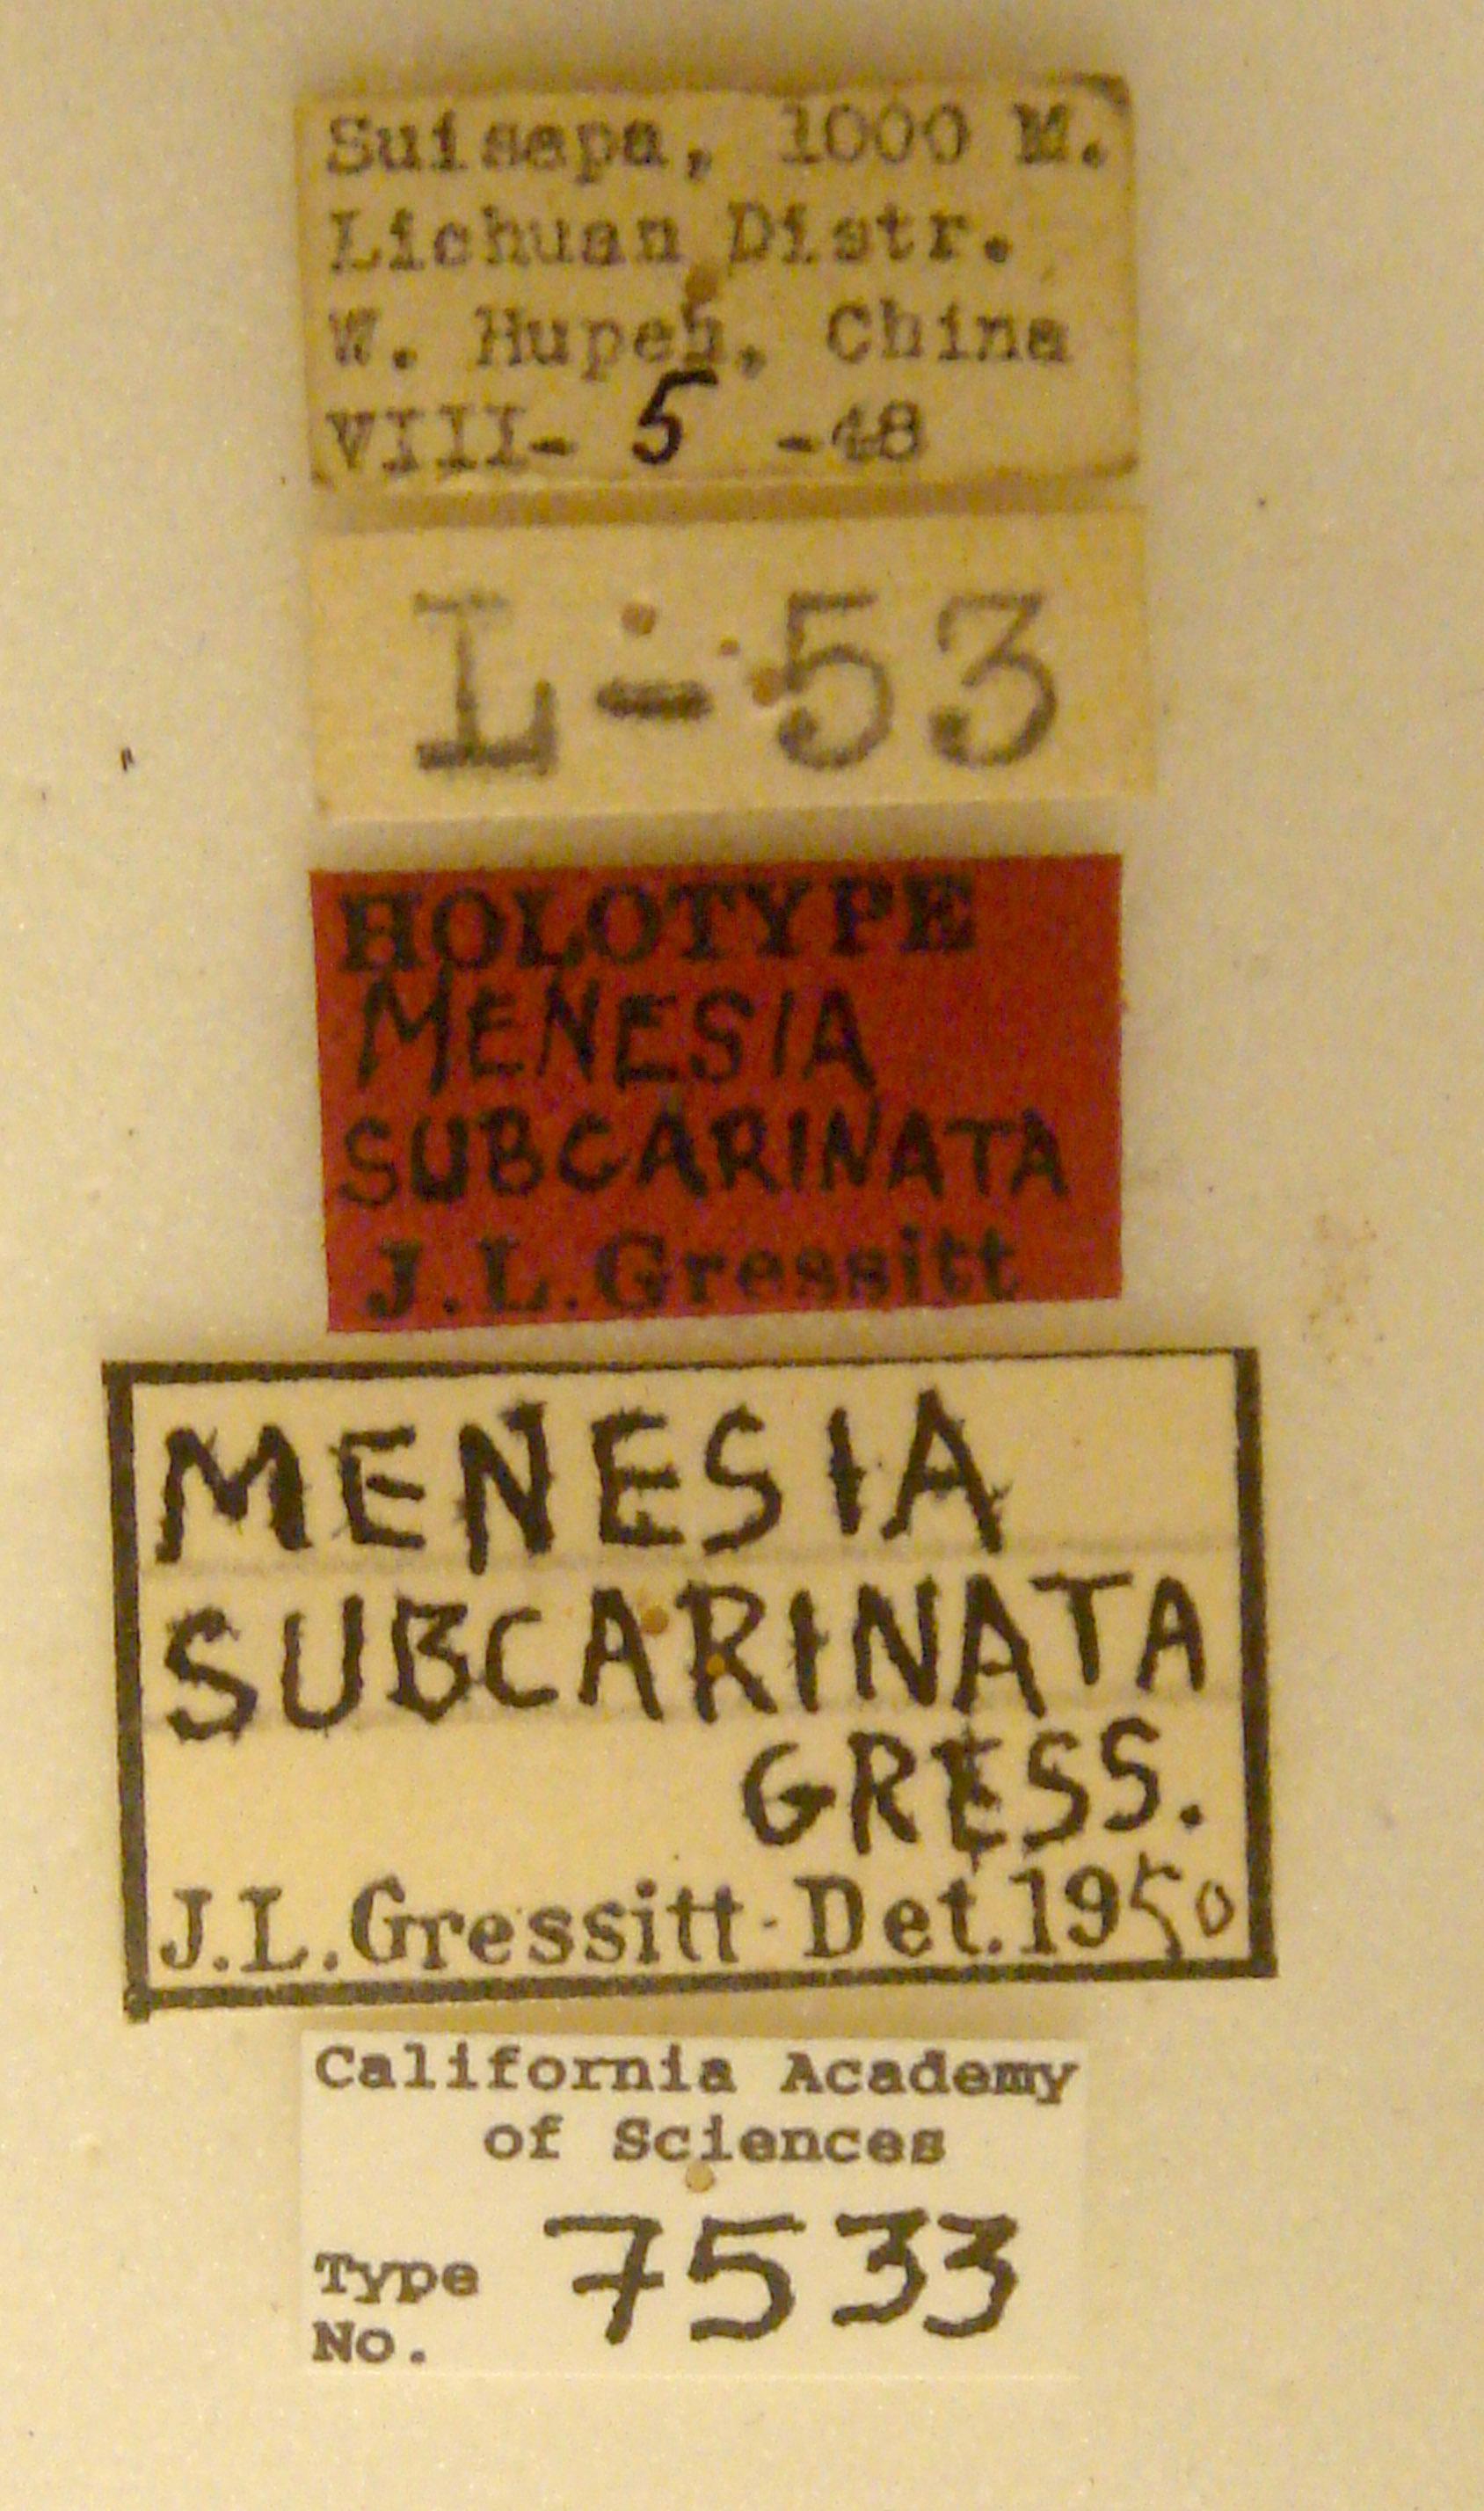 Menesia subcarinata image